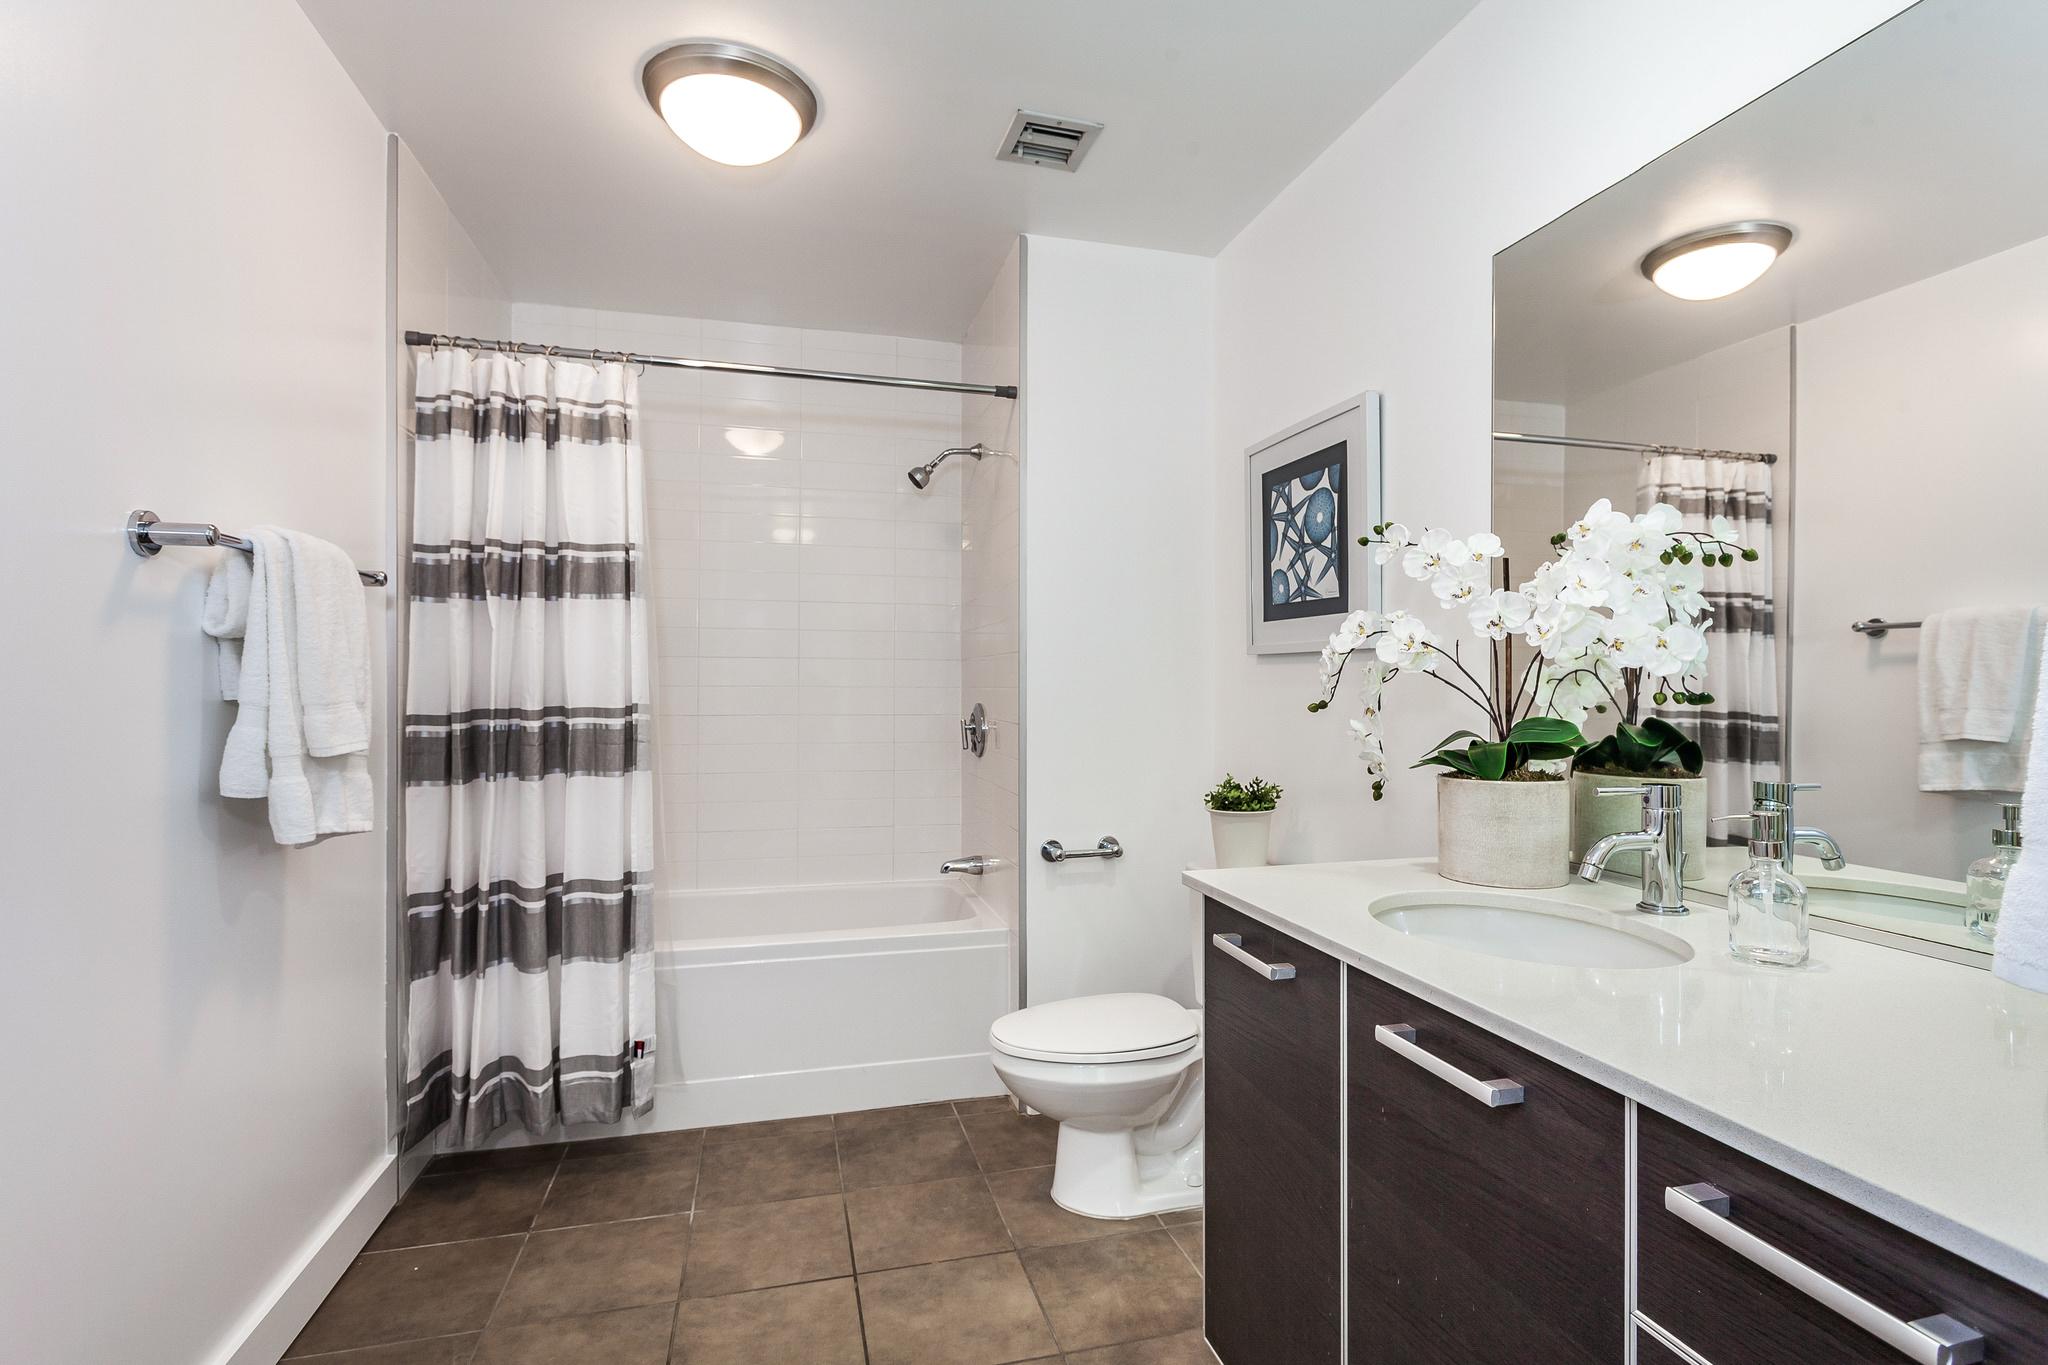 view of first bathroom from doorway